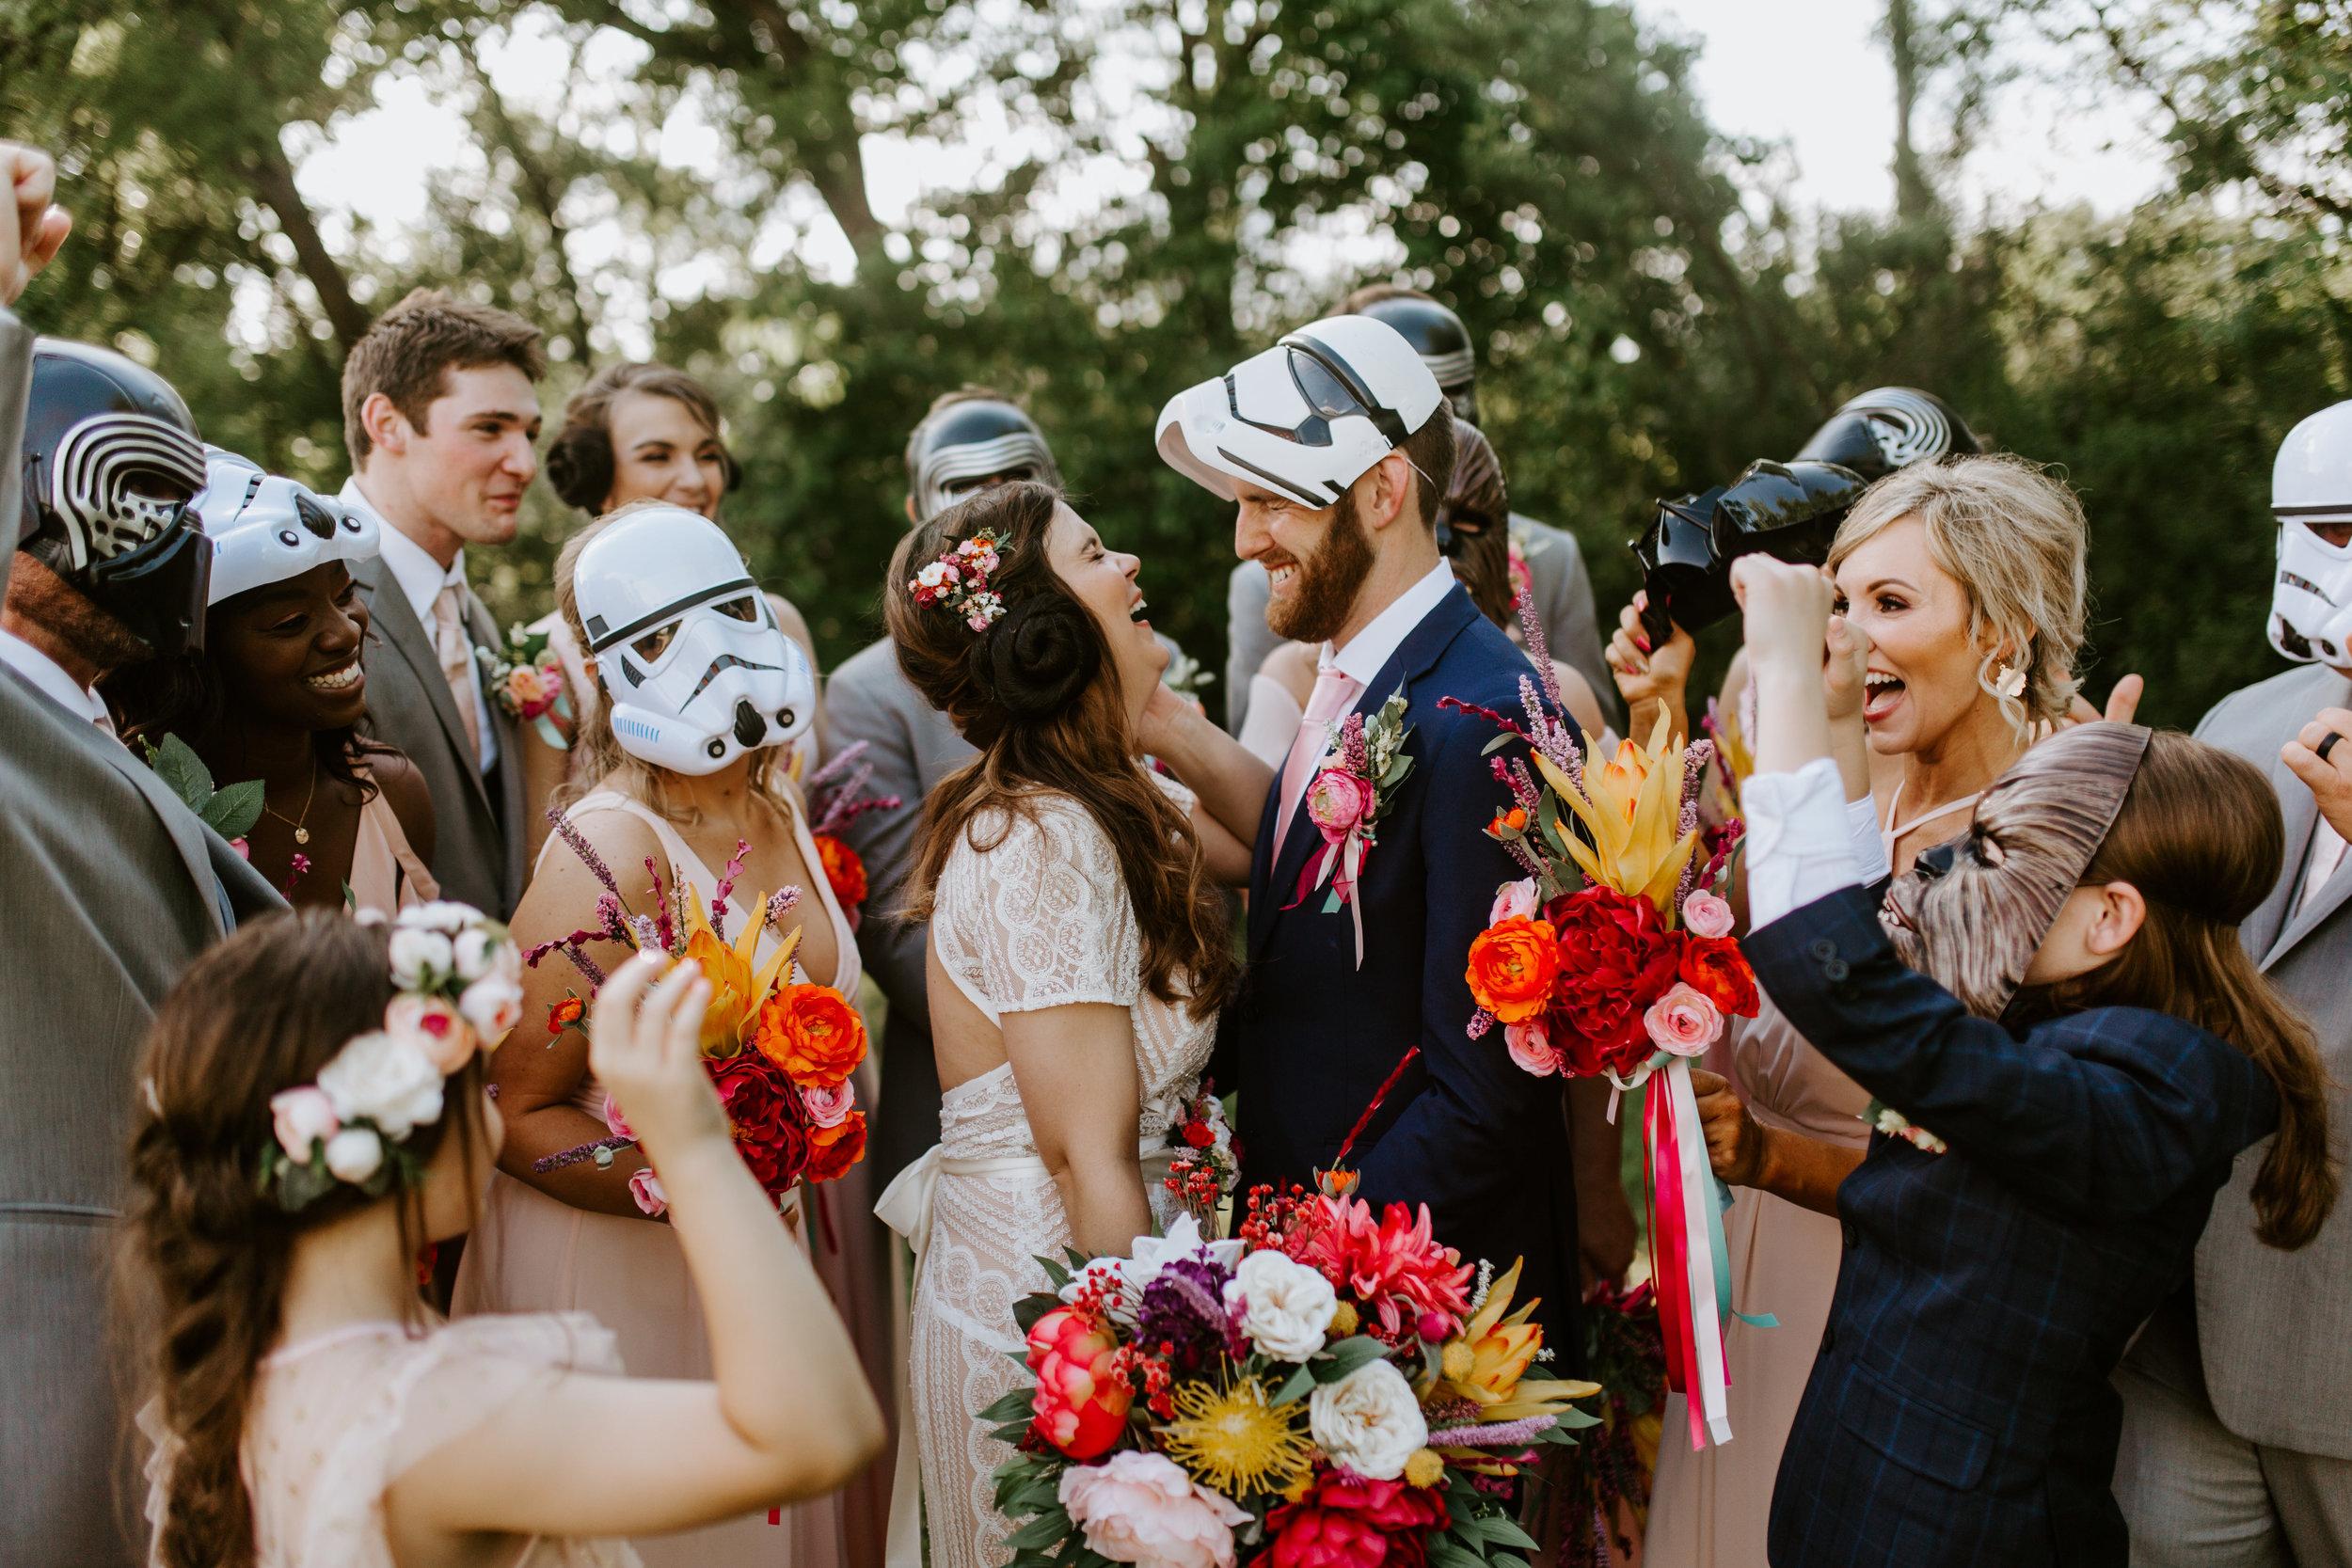 Ricki + Jaxon - The Jackson Wedding - Sneak Peeks! - Meme Urbane Photography_-6.jpg